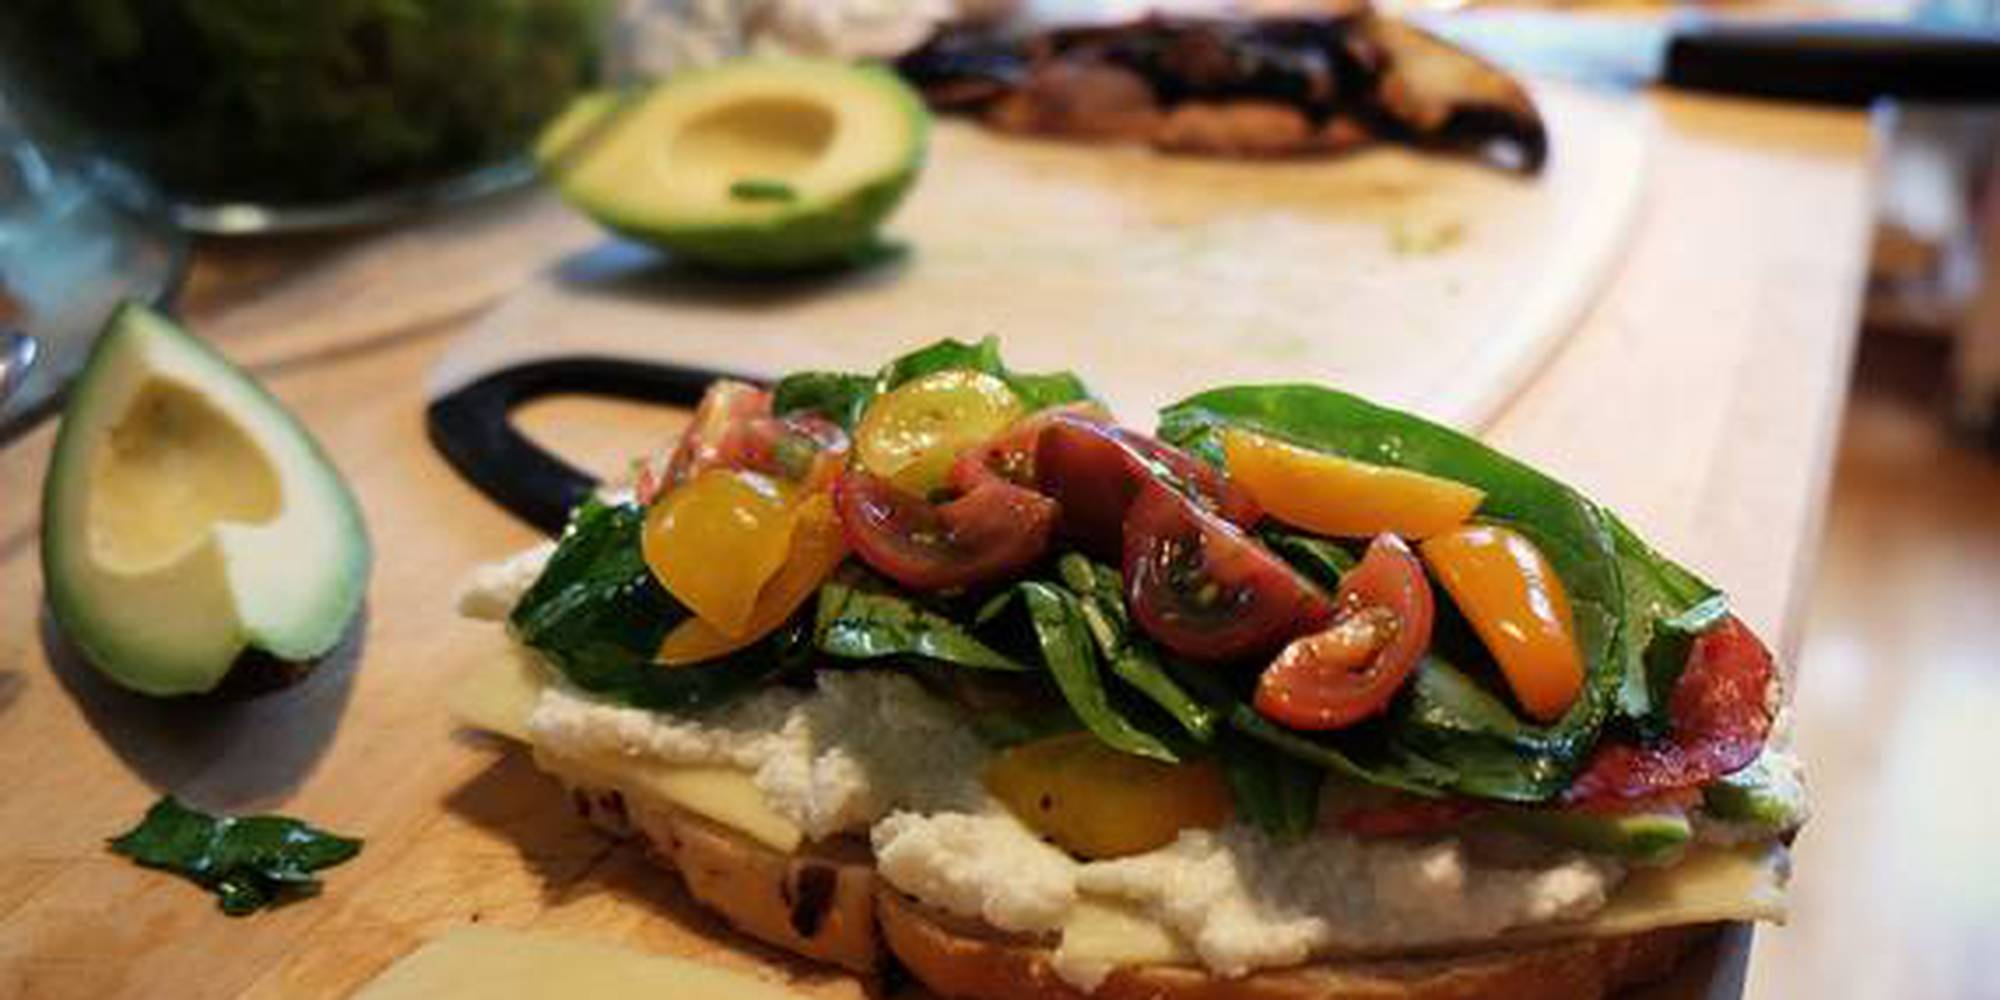 bread_food_sandwich_healthy-crop-c0-5__0-5-570x380-70.jpg